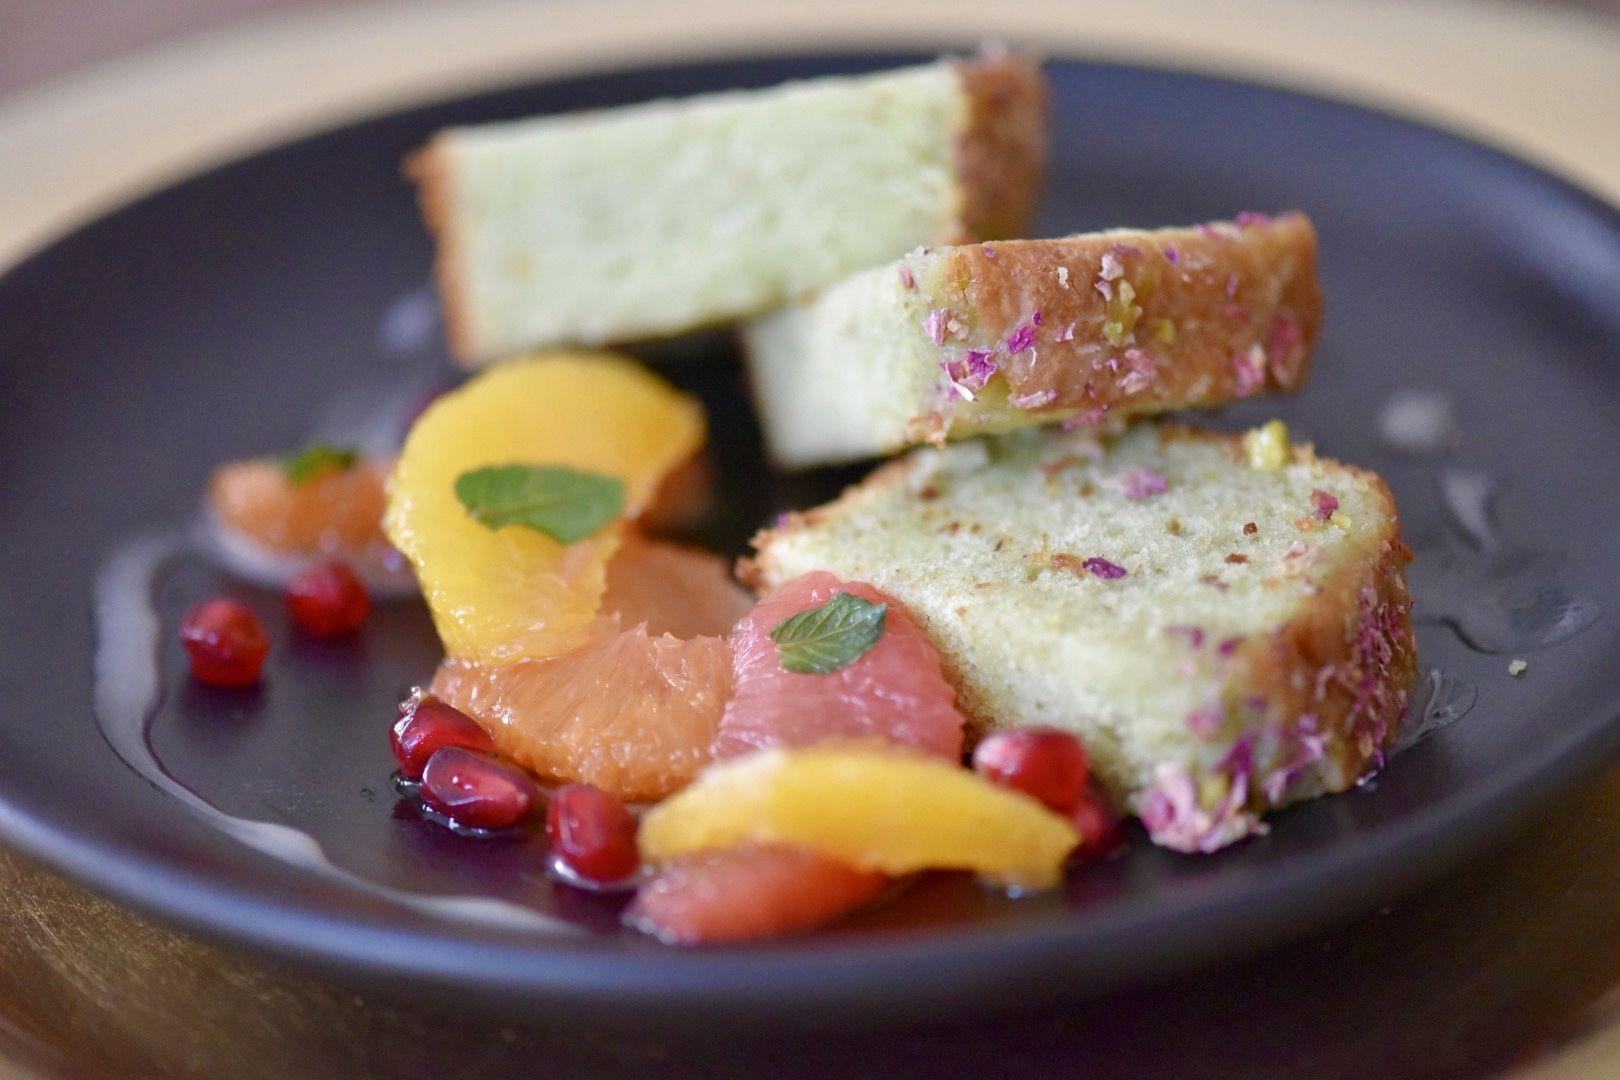 Pistsachio cardamom pound cake with orange blossom winter